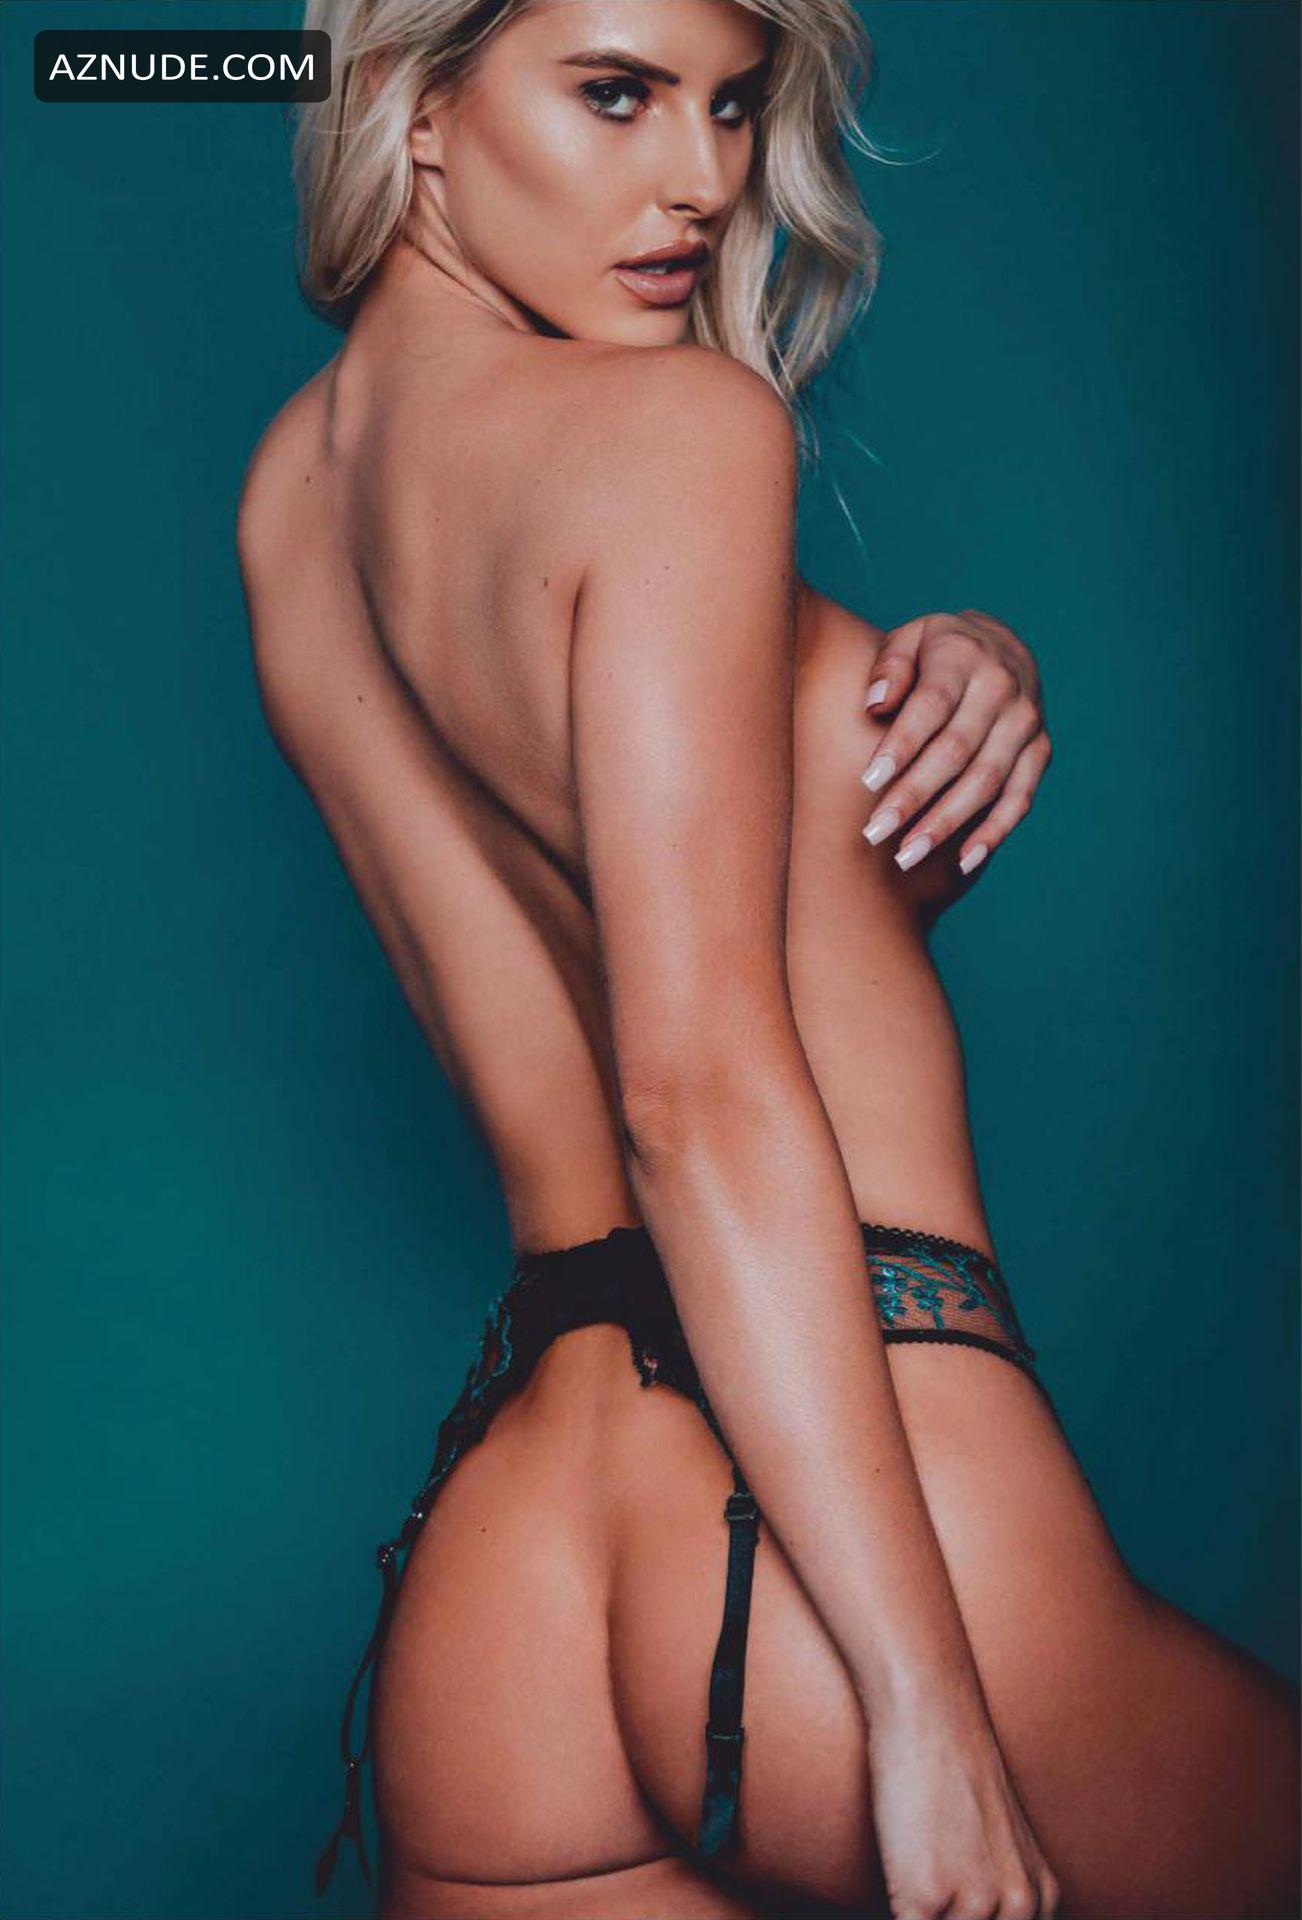 HOT MOVIE Angelina jolie sexiest pics